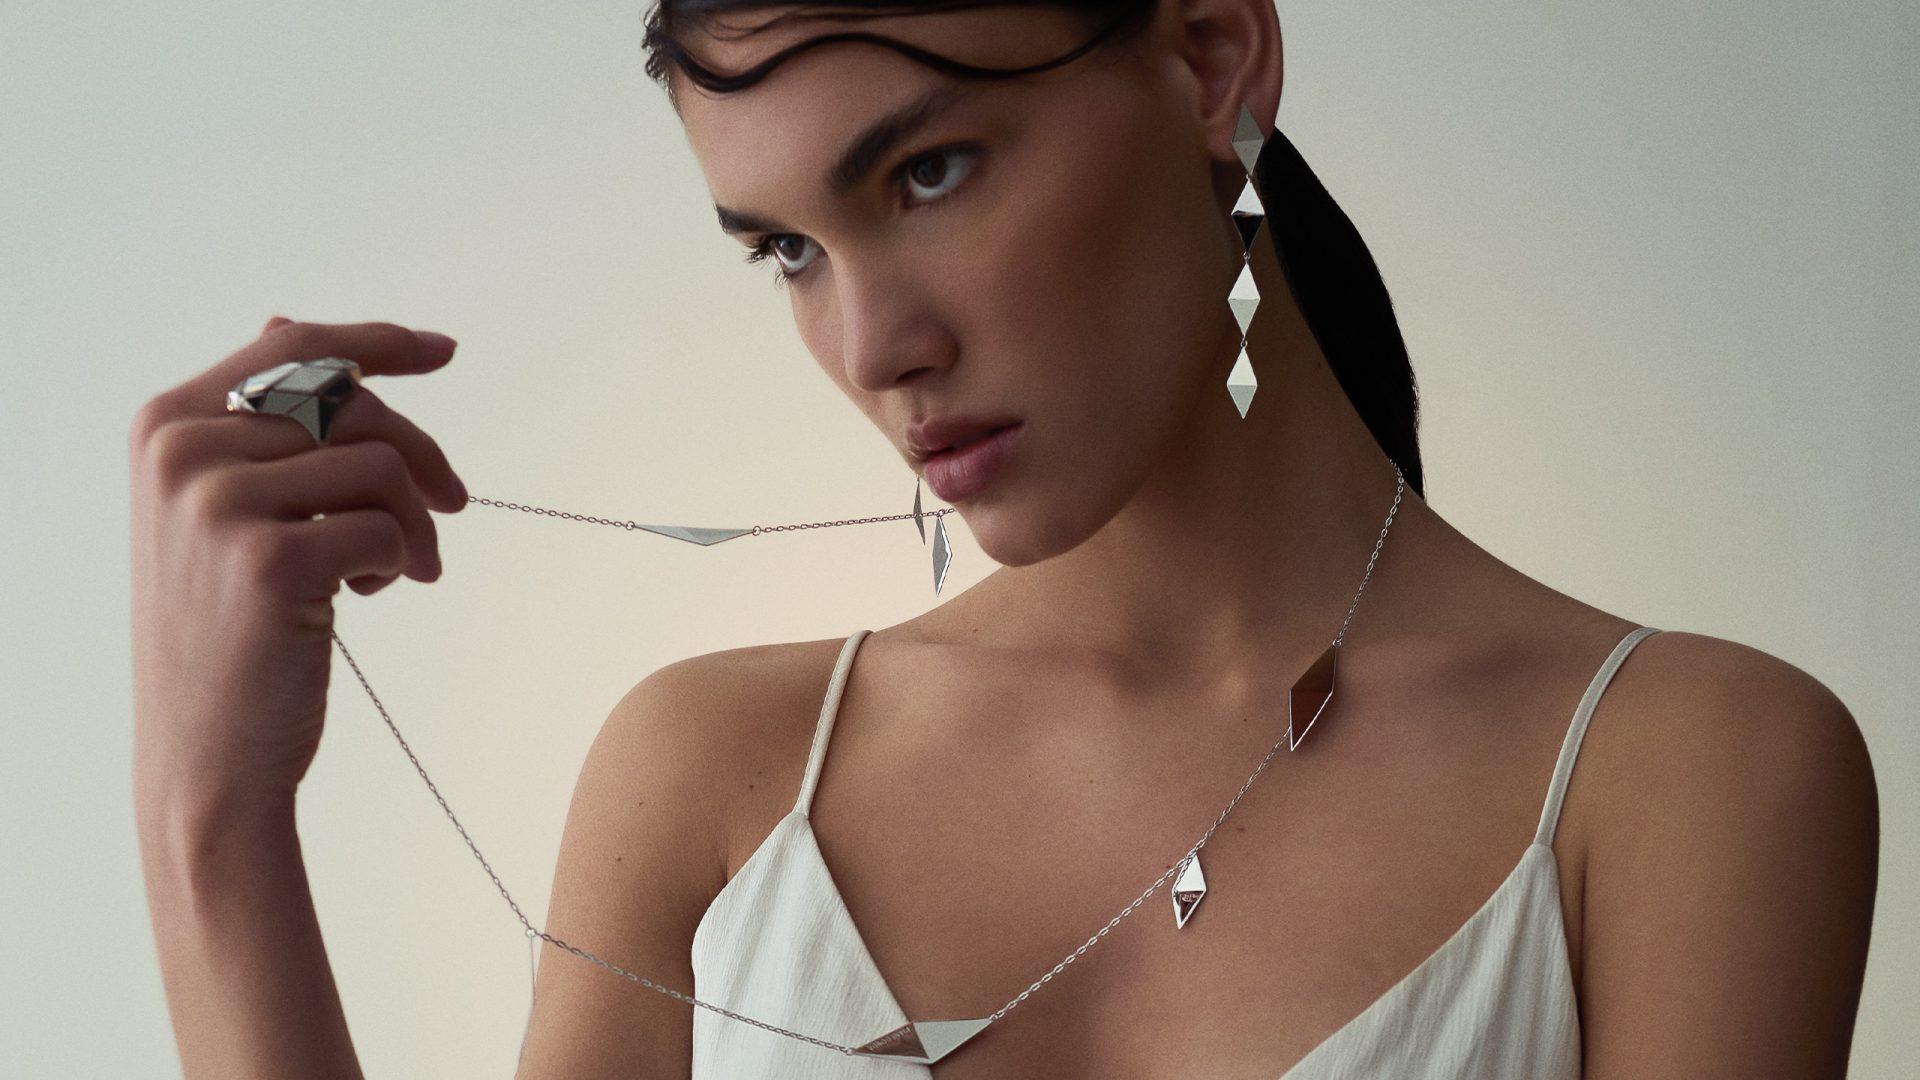 woman with pianegonda necklace